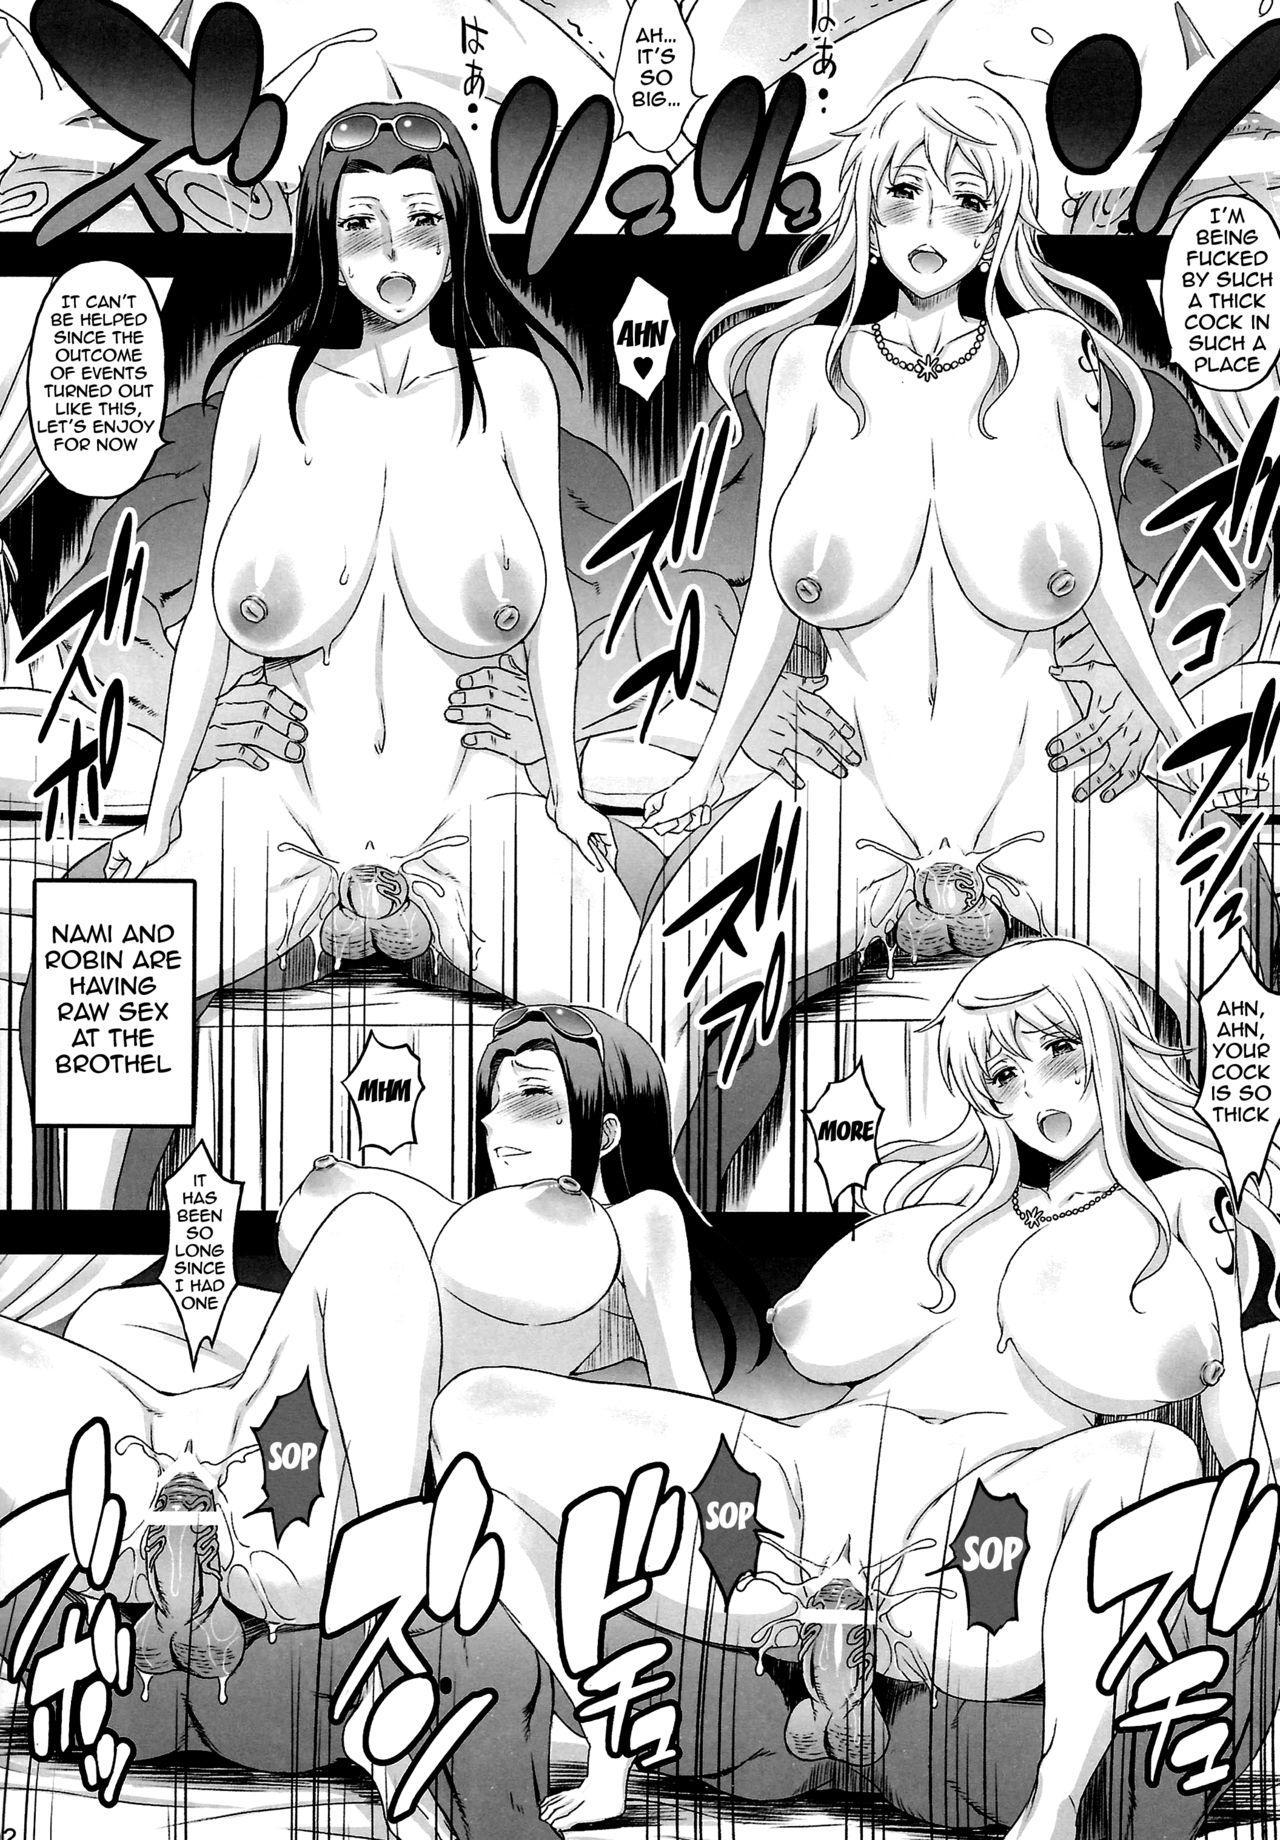 (C87) [Diogenes Club (Haikawa Hemlen)] Rakuen Onna Kaizoku Soushuuhen ~GOLD~ - Woman Pirate in Paradise (One Piece) [English] {doujin-moe.us} [Incomplete] 7